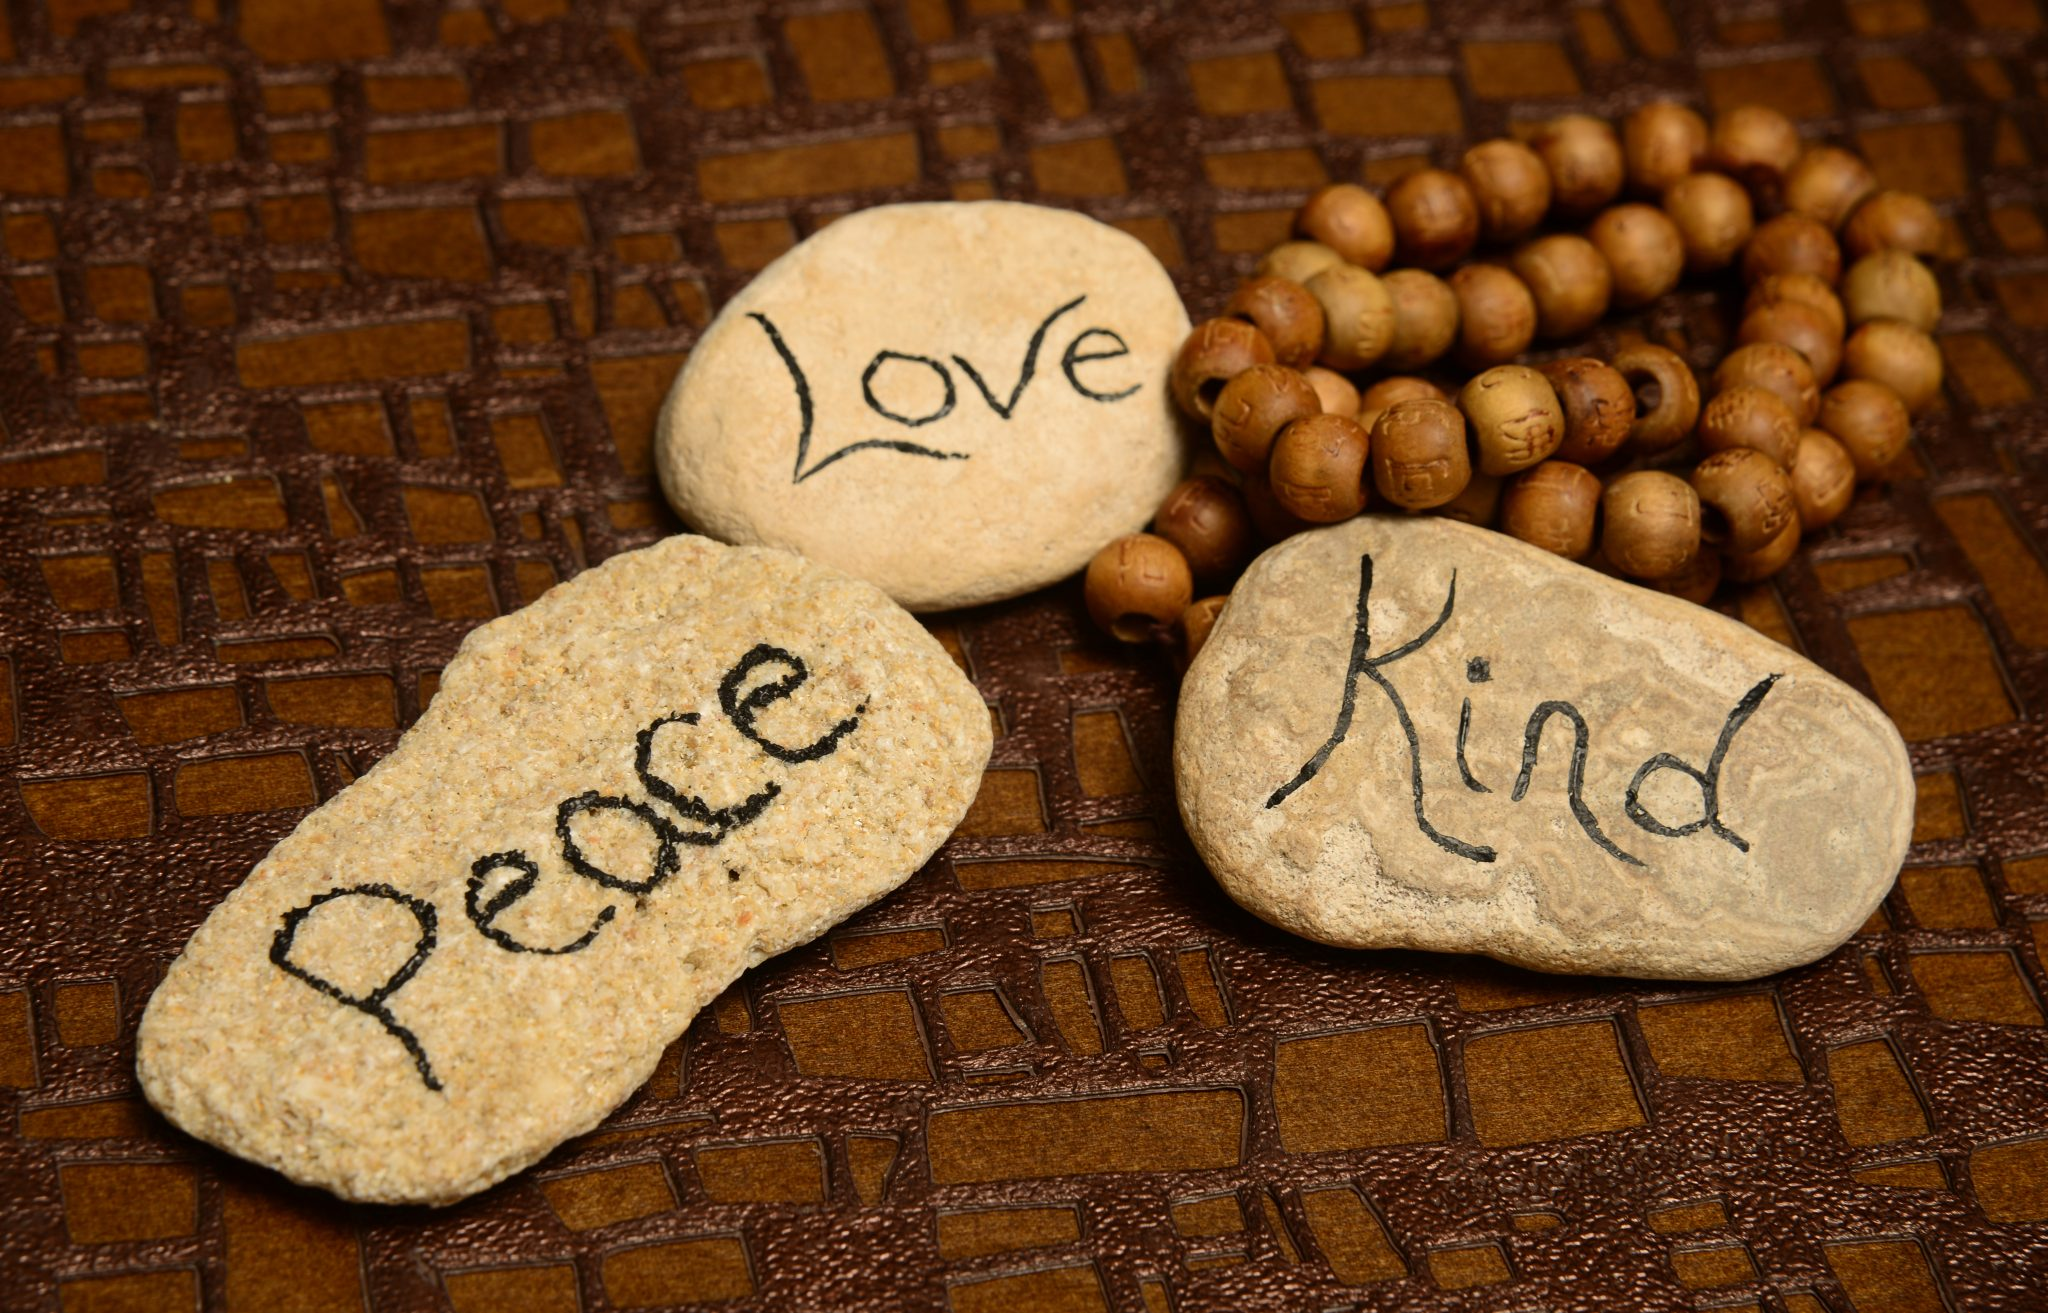 peace, love and kindness rocks